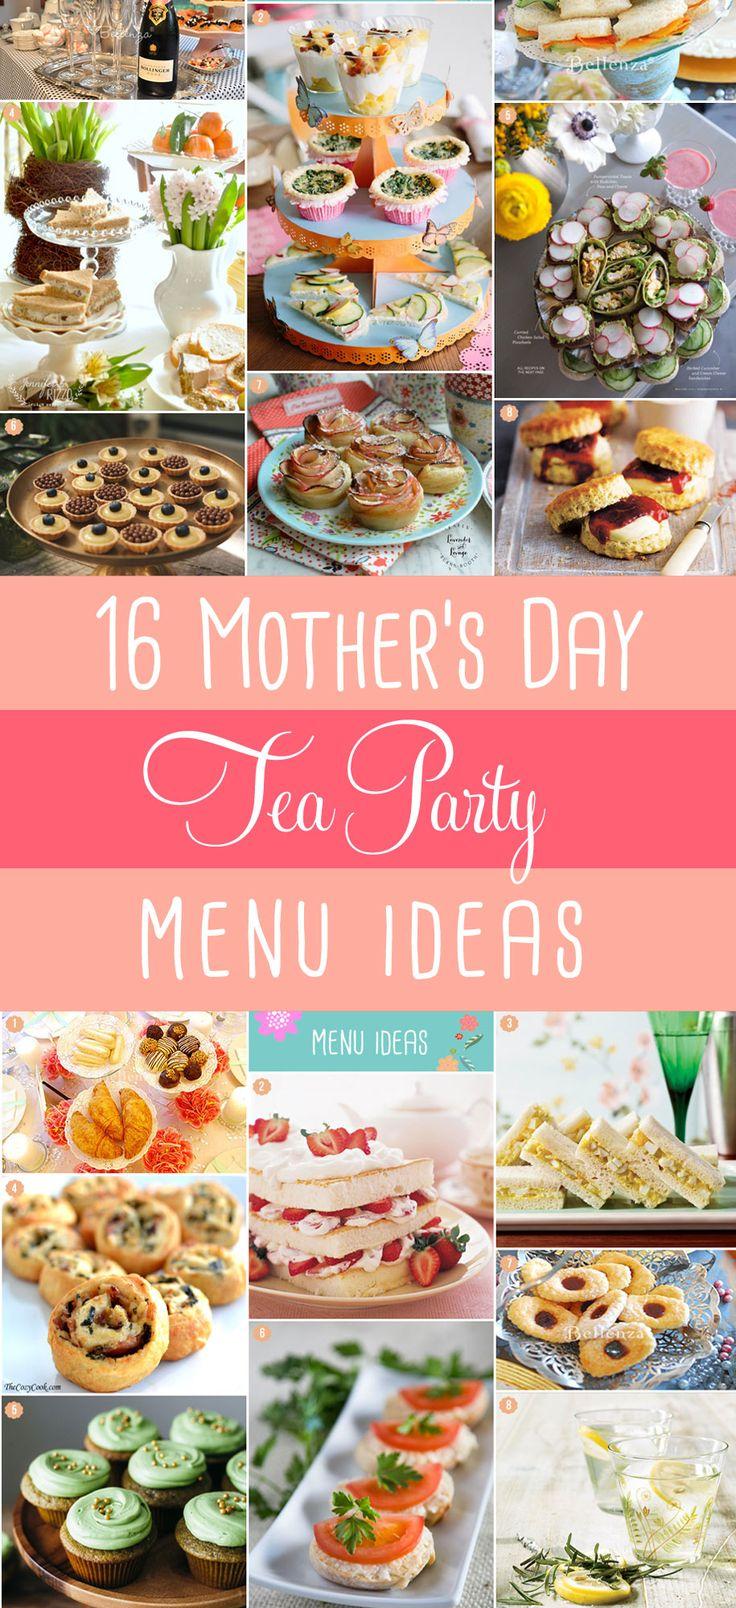 328 best MOTHER'S DAY BRUNCH IDEAS images on Pinterest ...